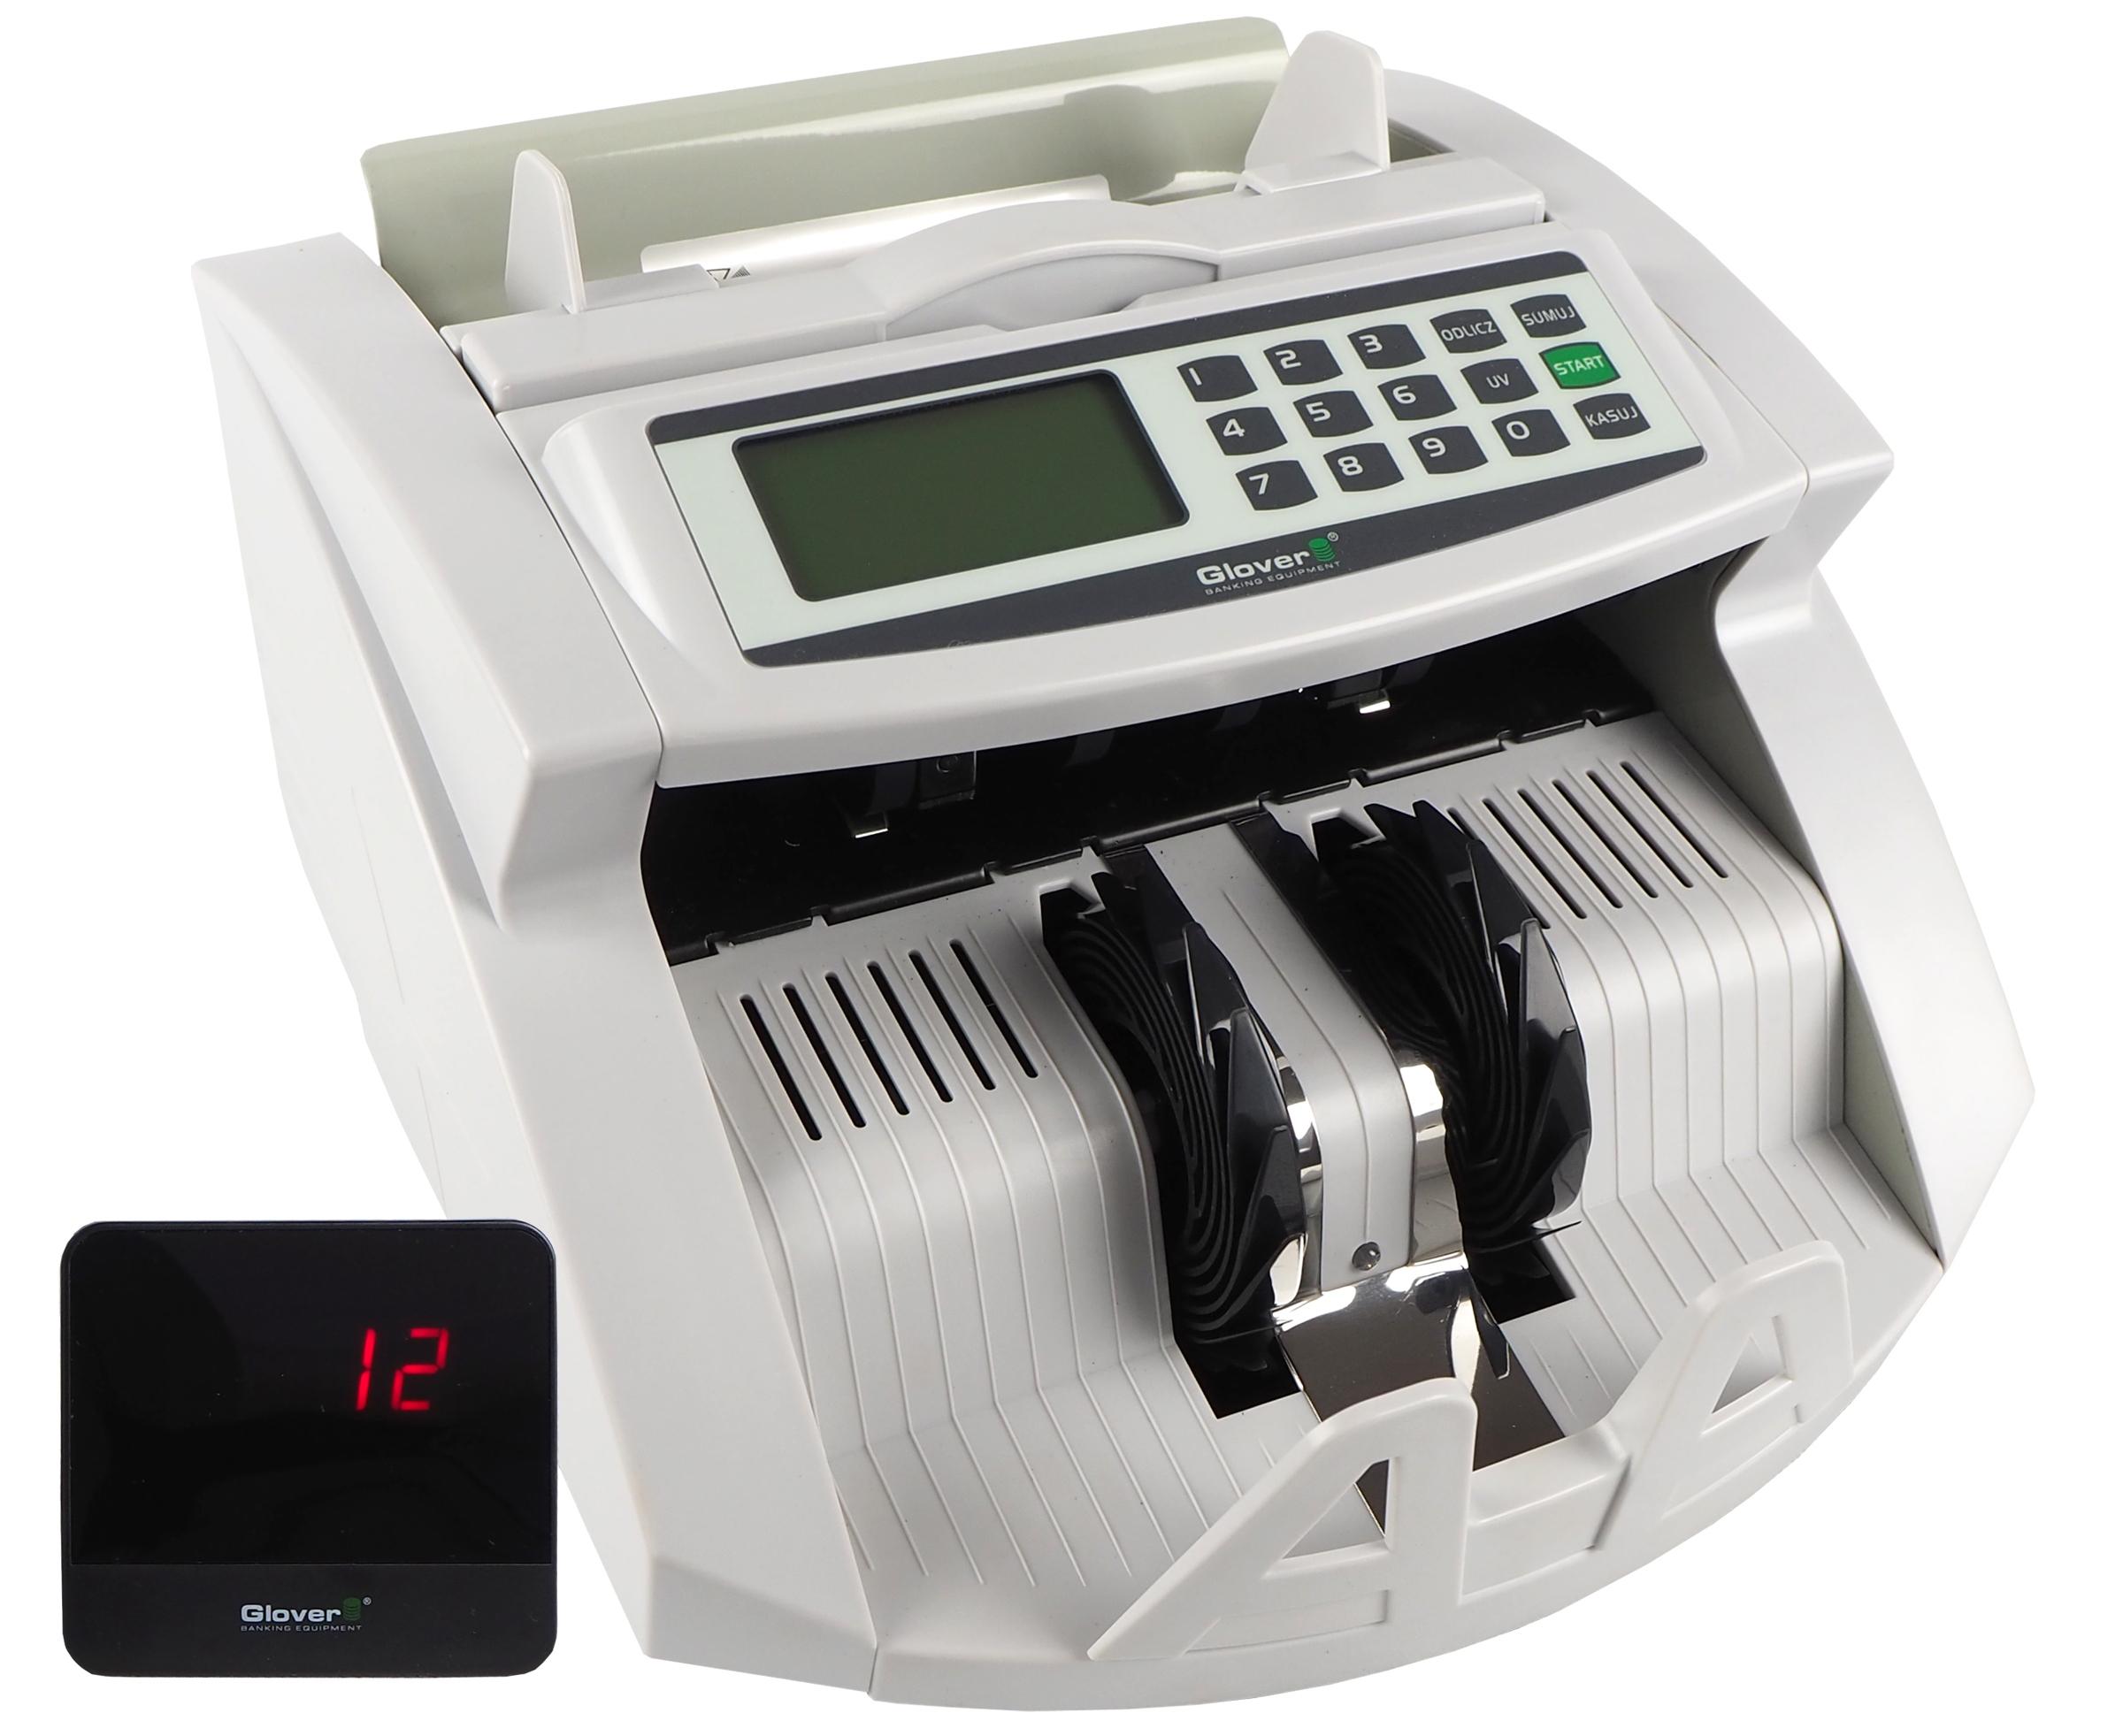 Markowa Glover GC-10 UV / LCD Bankovky